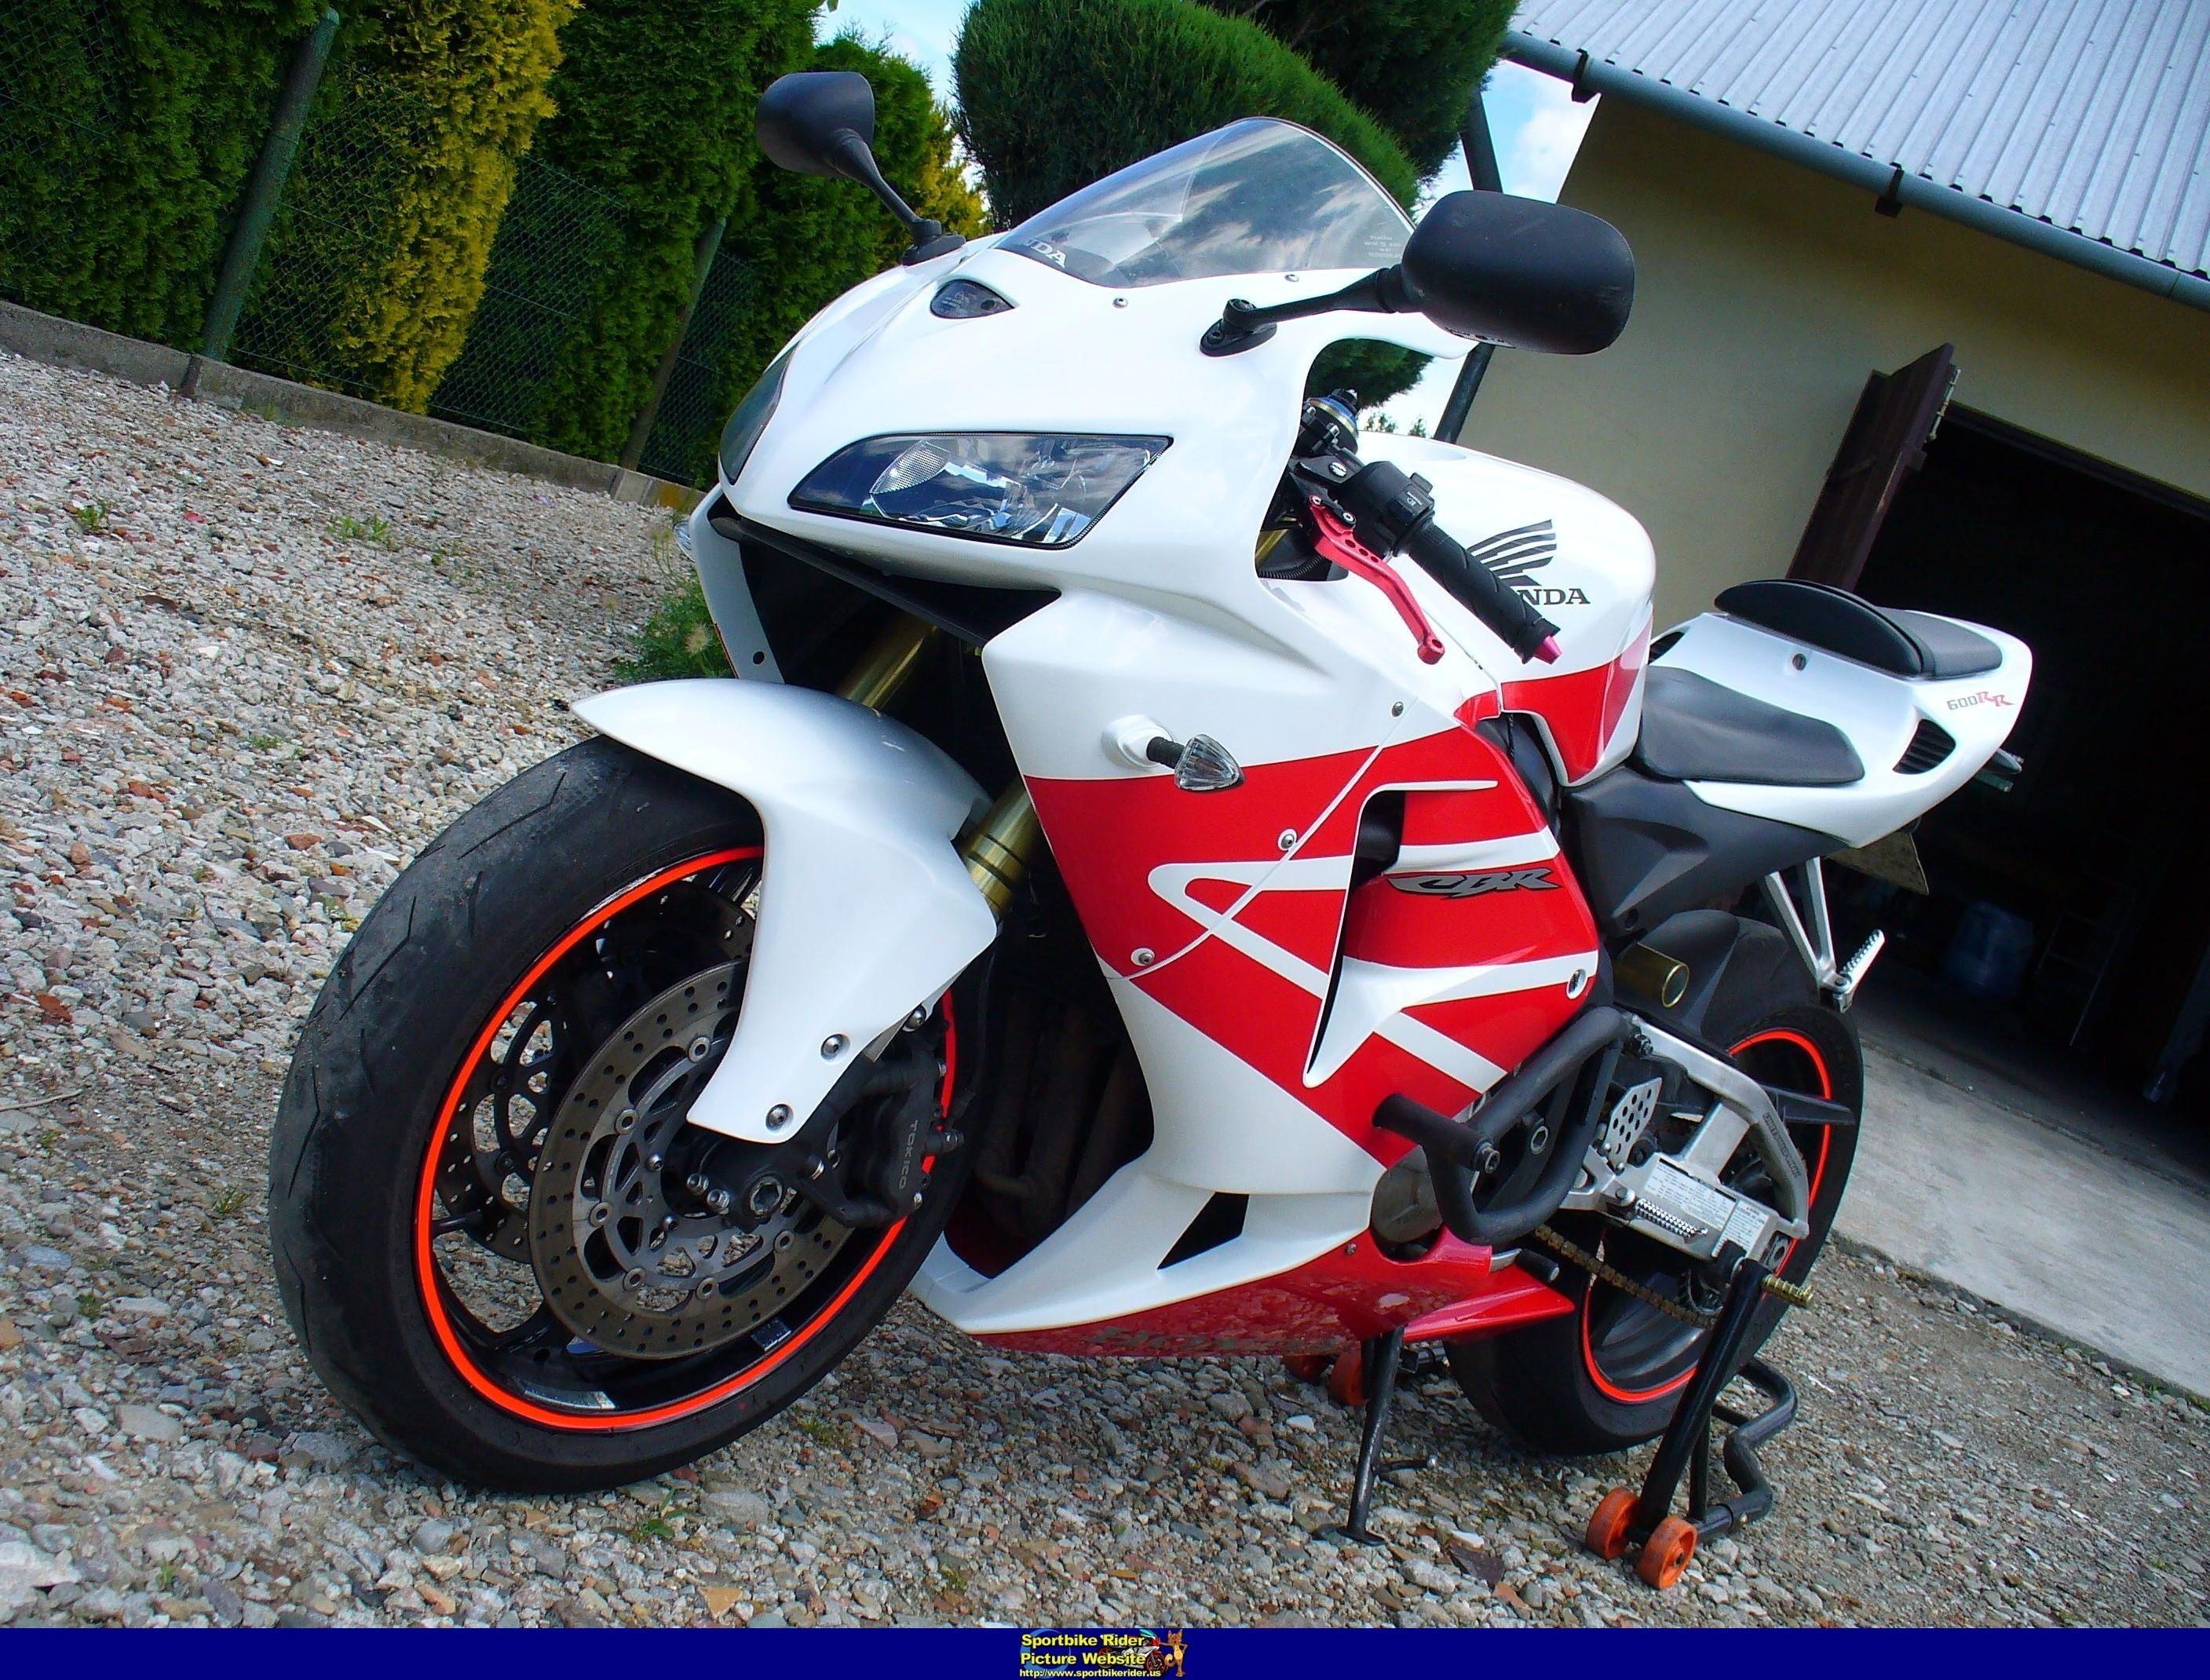 2005 Honda Cbr 600 Rr Honda Love Honda Sport Bikes Honda Cbr